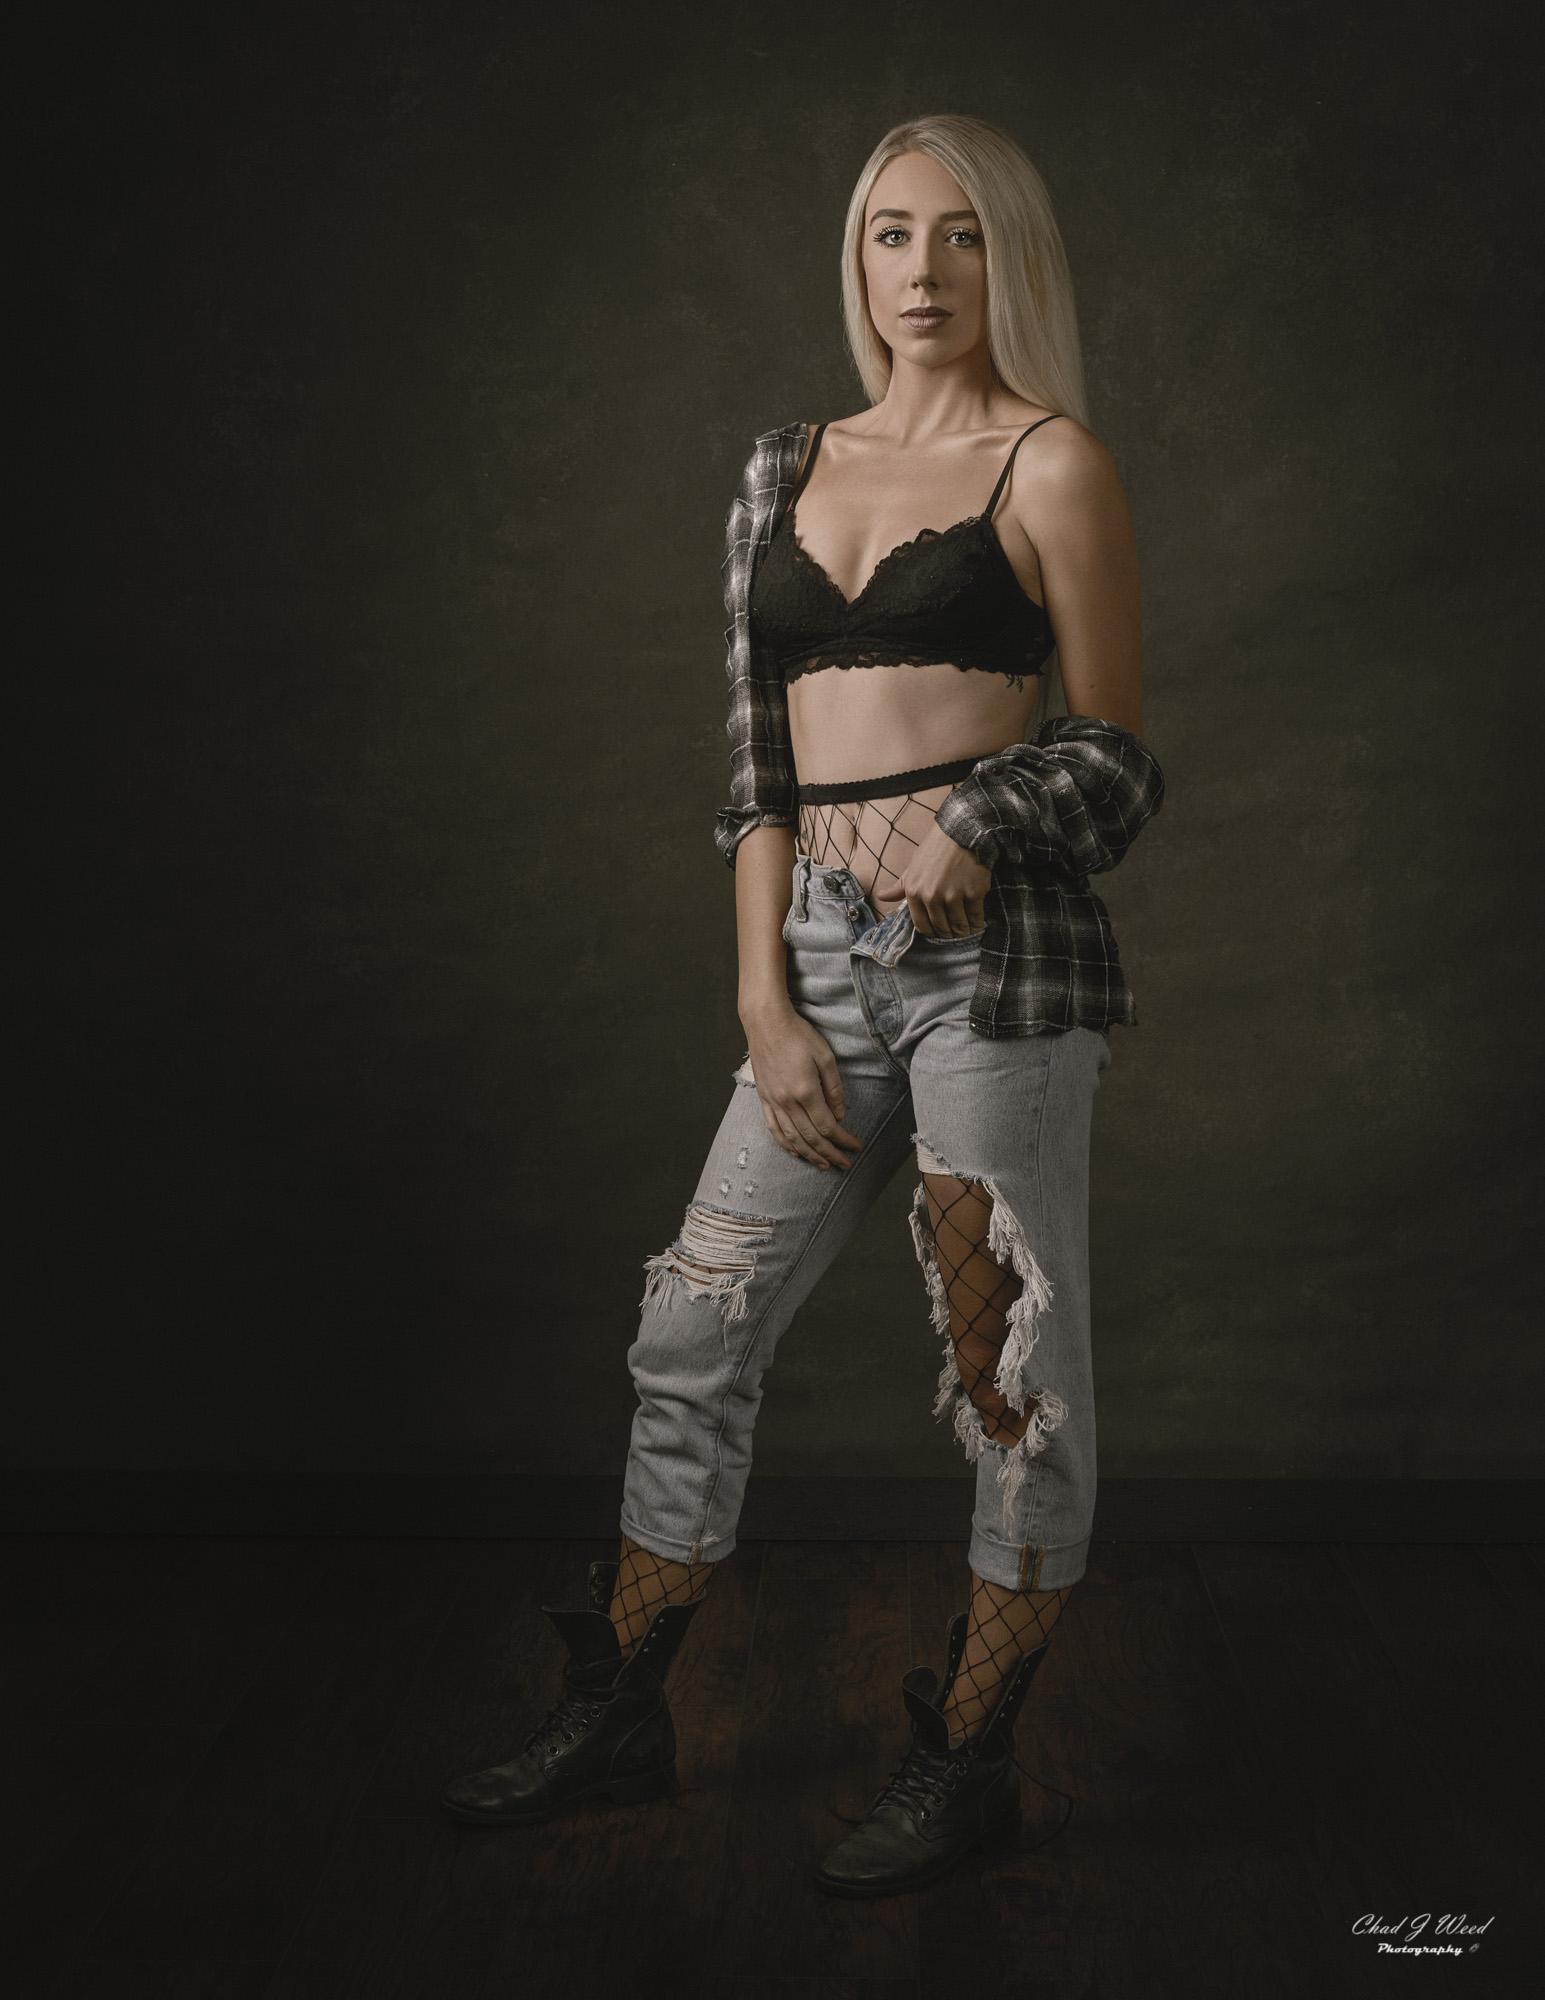 Arizona Portrait Photographer Chad Weed with Fashion Model Ashlyn